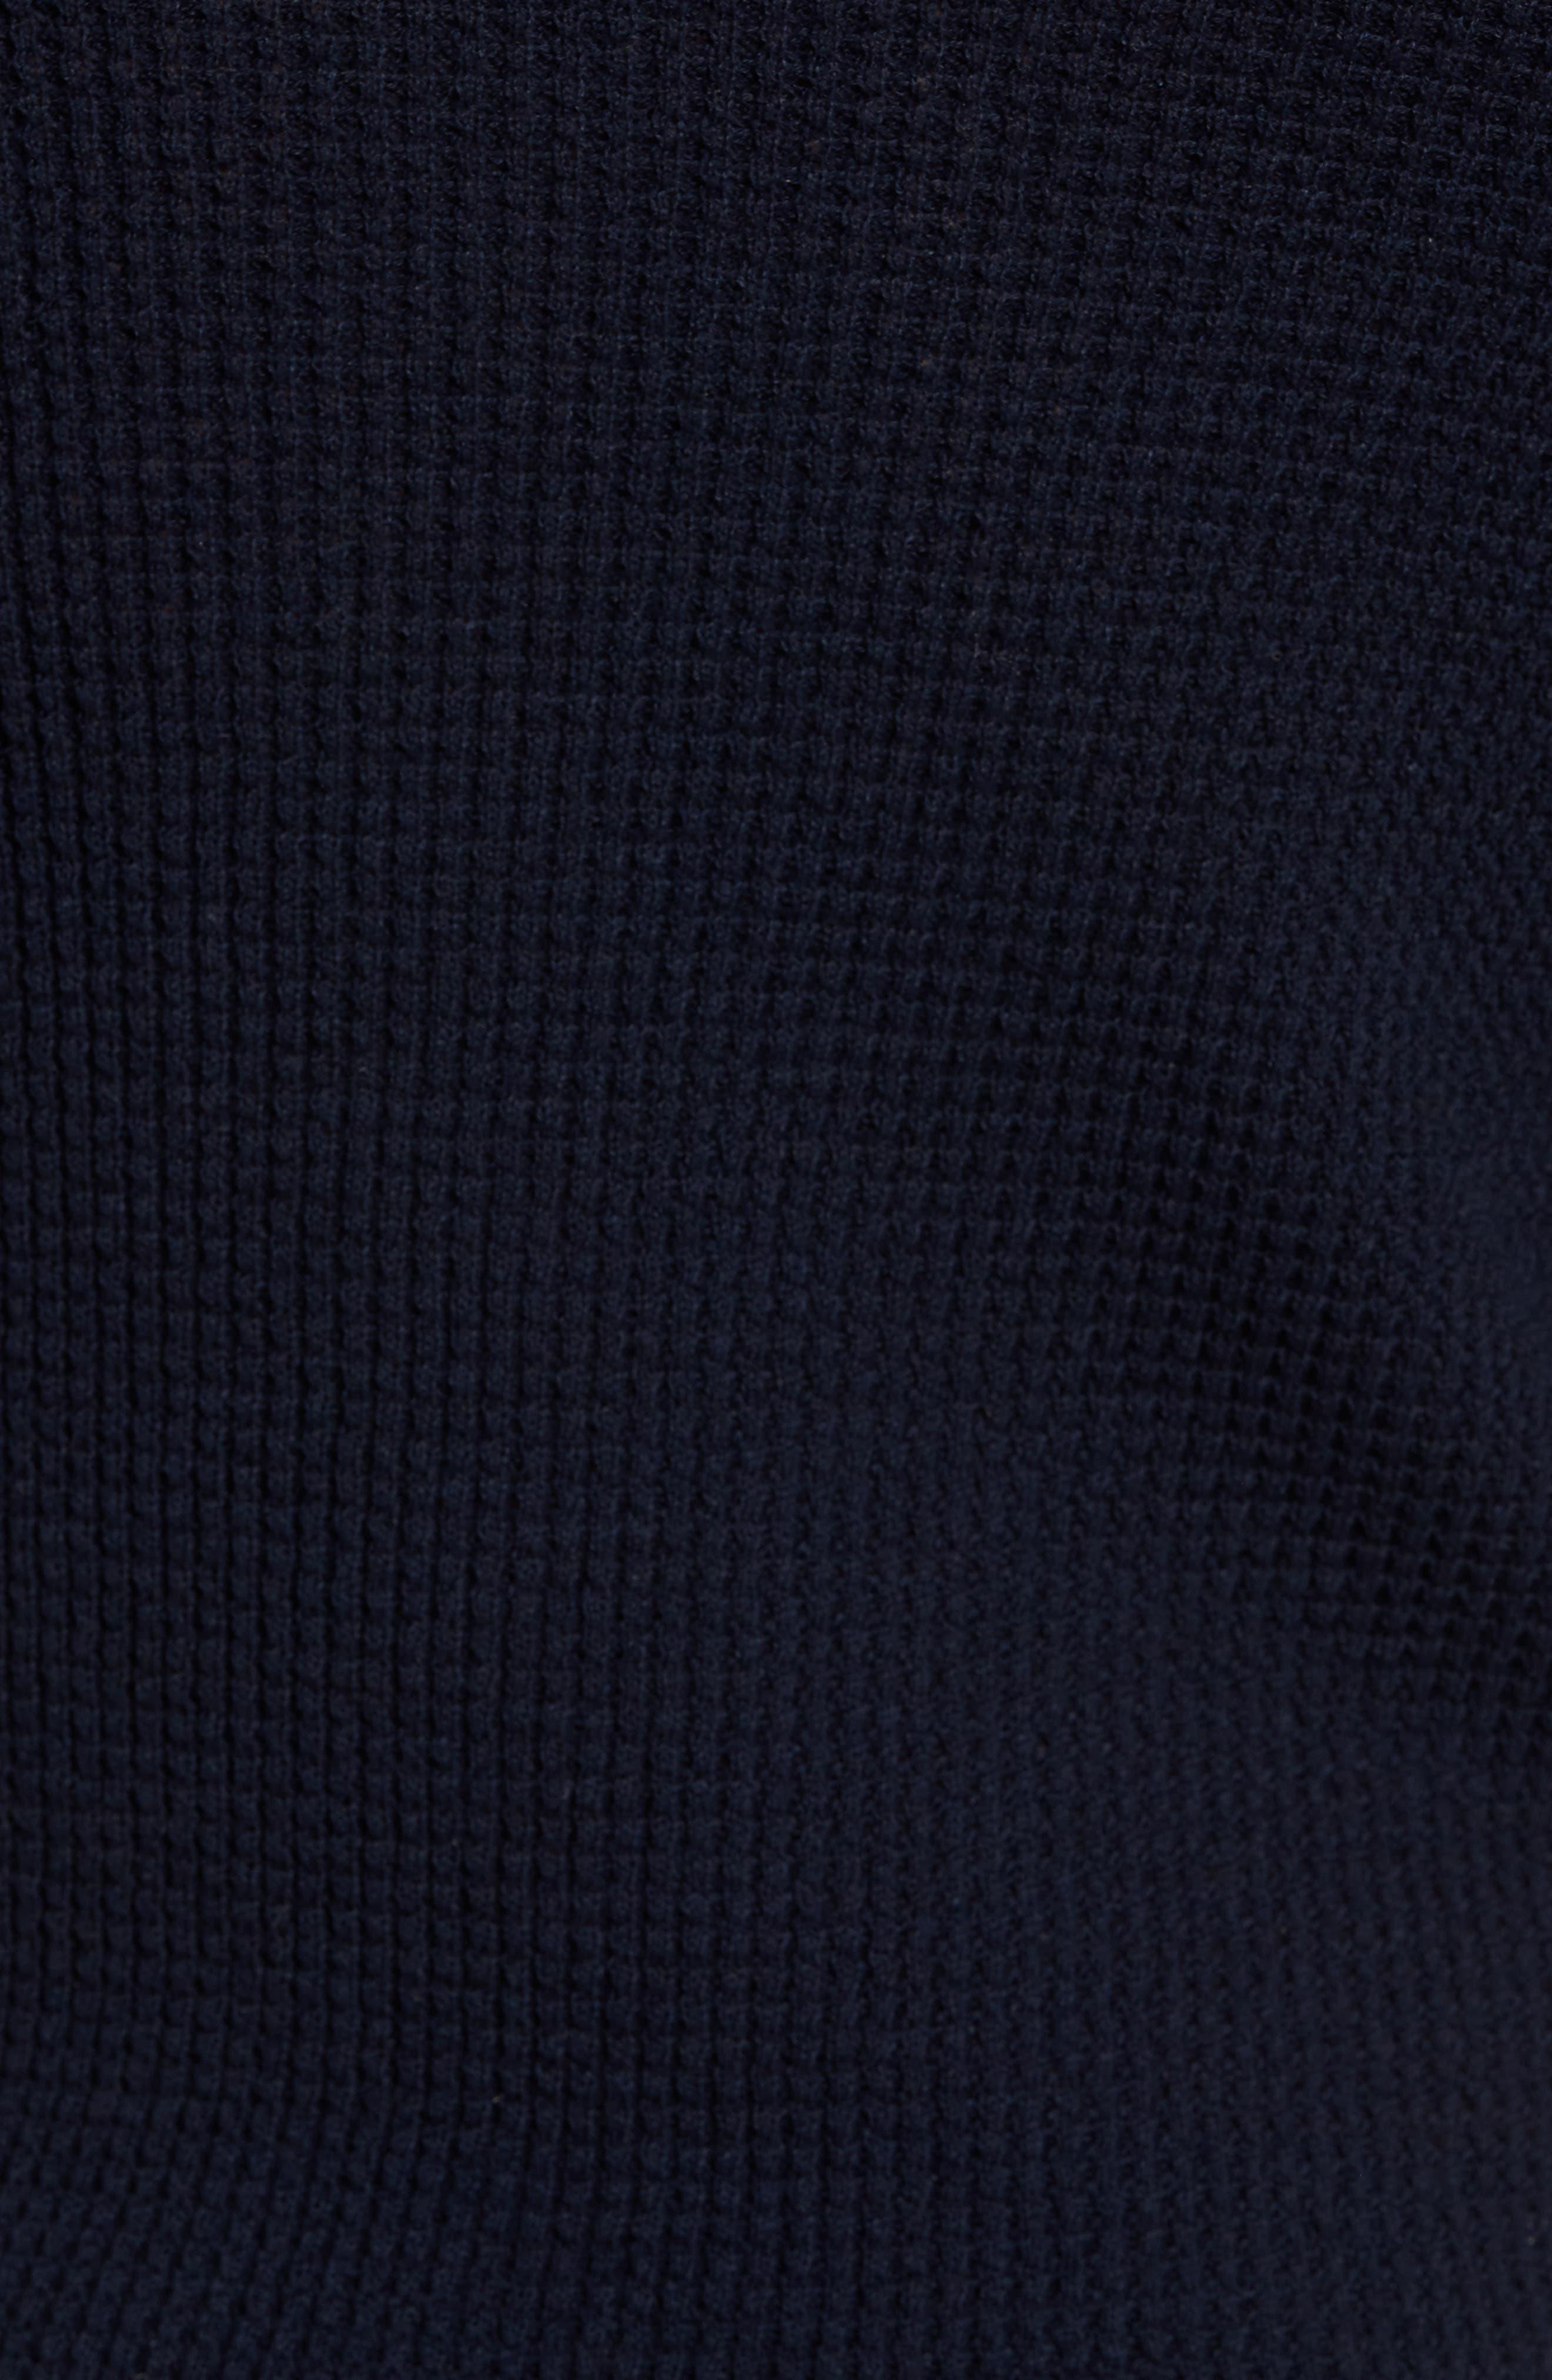 Thermal Pullover Hoodie,                             Alternate thumbnail 5, color,                             Marine